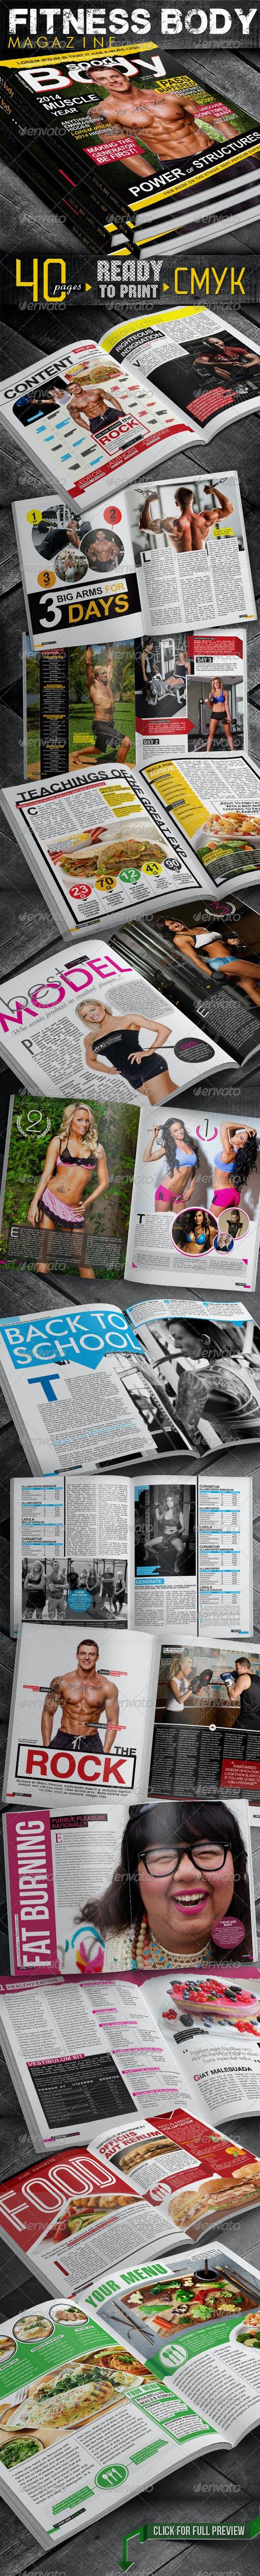 Fitness Body Magazine - Magazines Print Templates